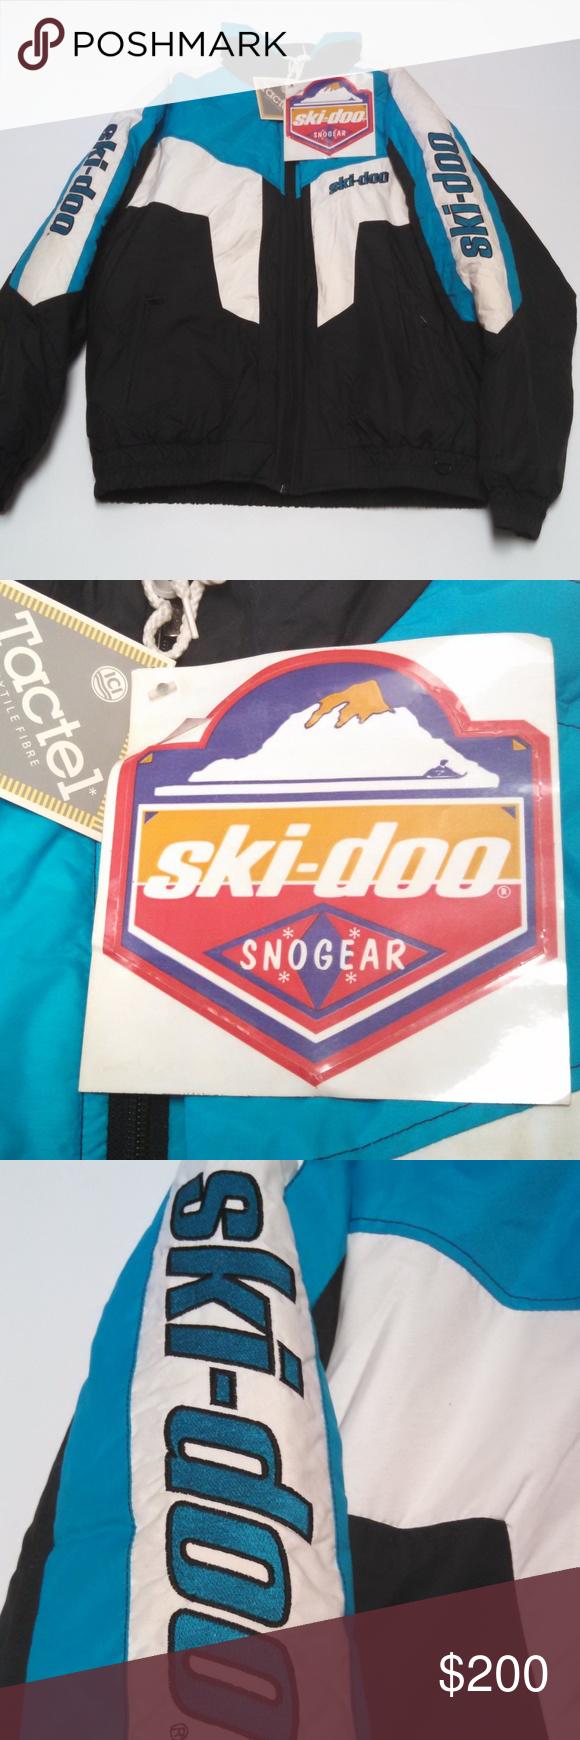 Ski Doo Snowmobile Jacket Large New Old Stock Men S Vintage Ski Doo Bombardier Jacket Large Snowmobile Coat Veste Catskill Full Zip Co My Posh Picks Fashi